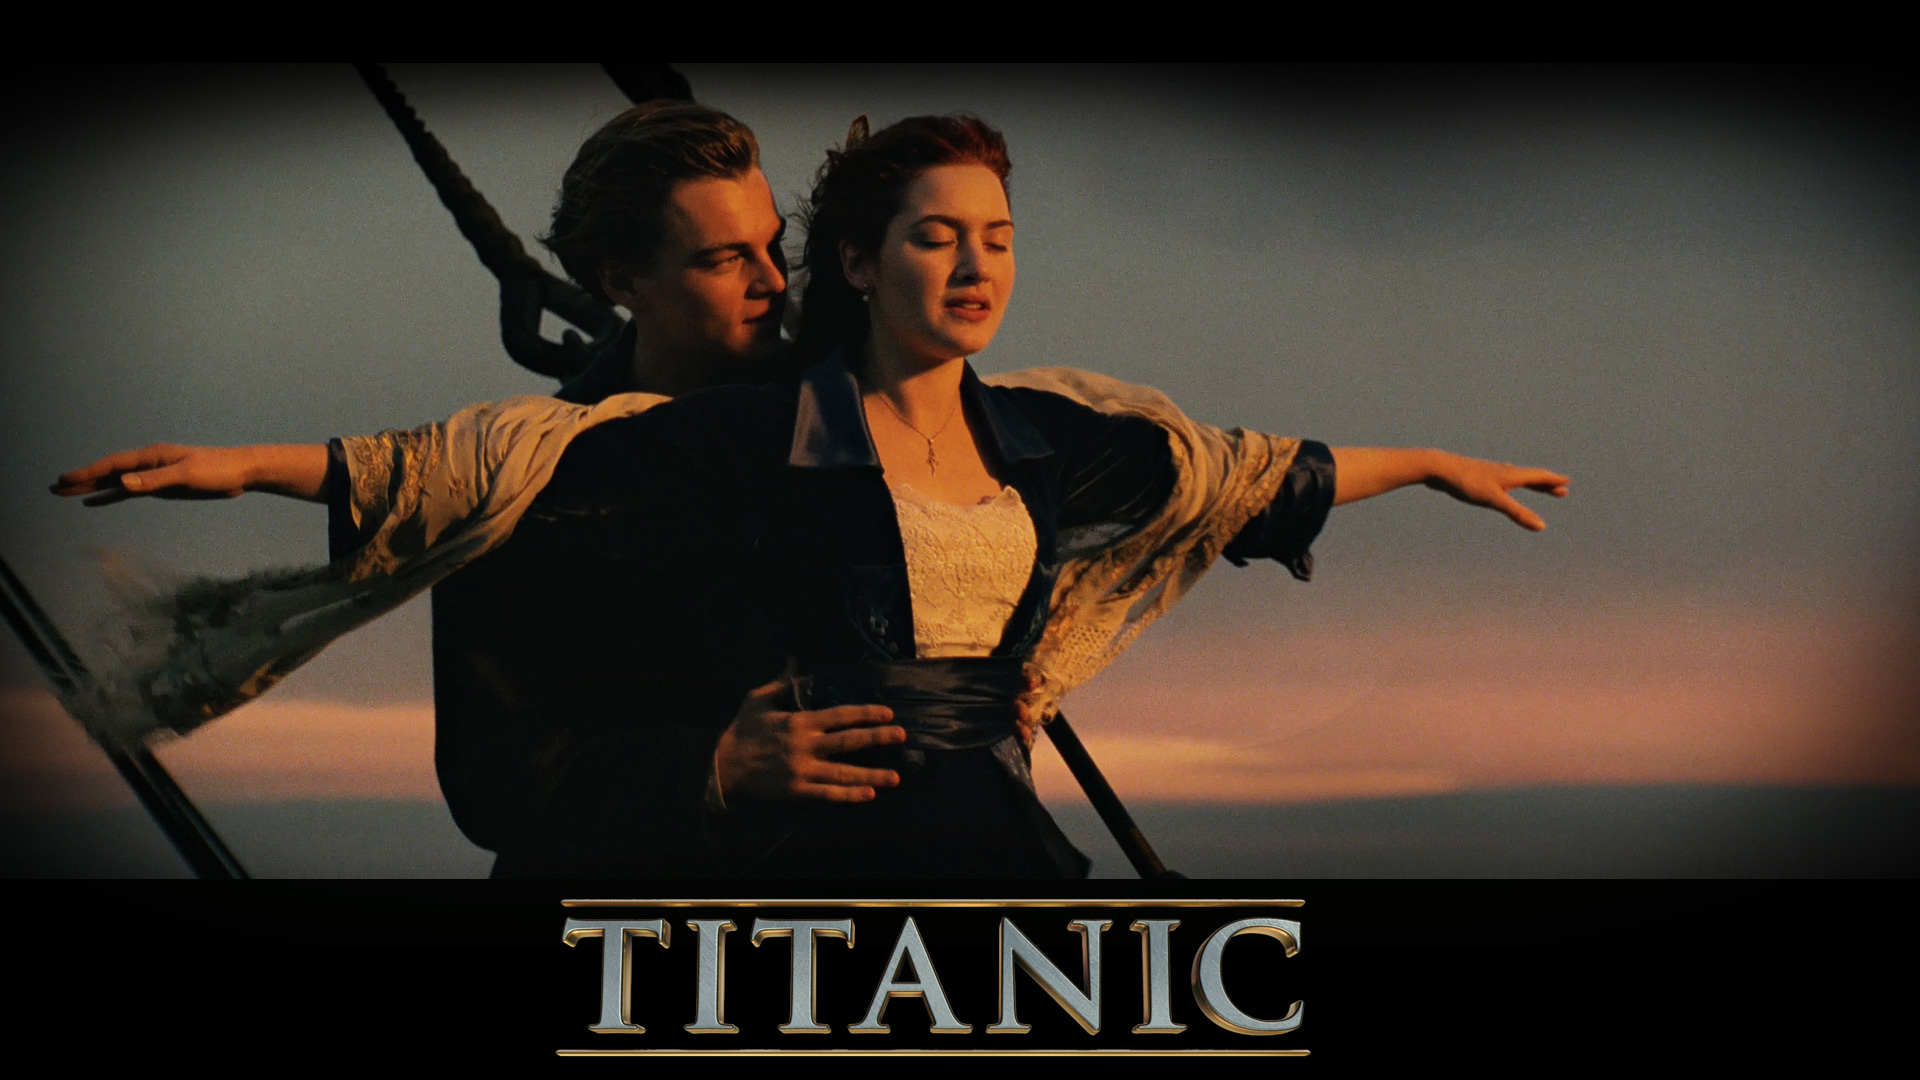 Titanic 3d Wallpaper 2012 Movie HD Desktop Wallpapers 1920x1080